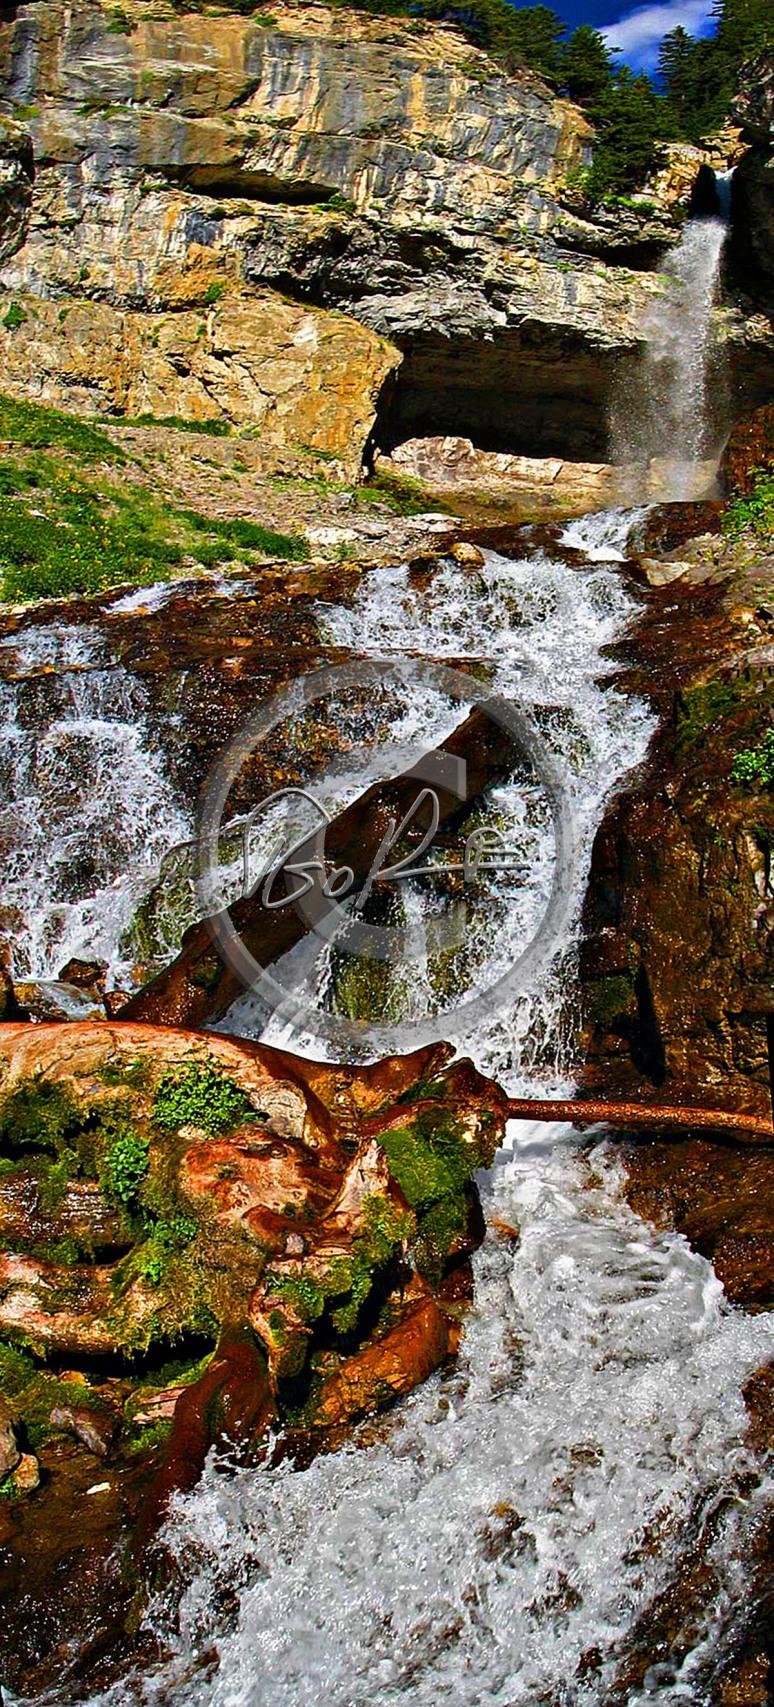 WaterfallCreekID